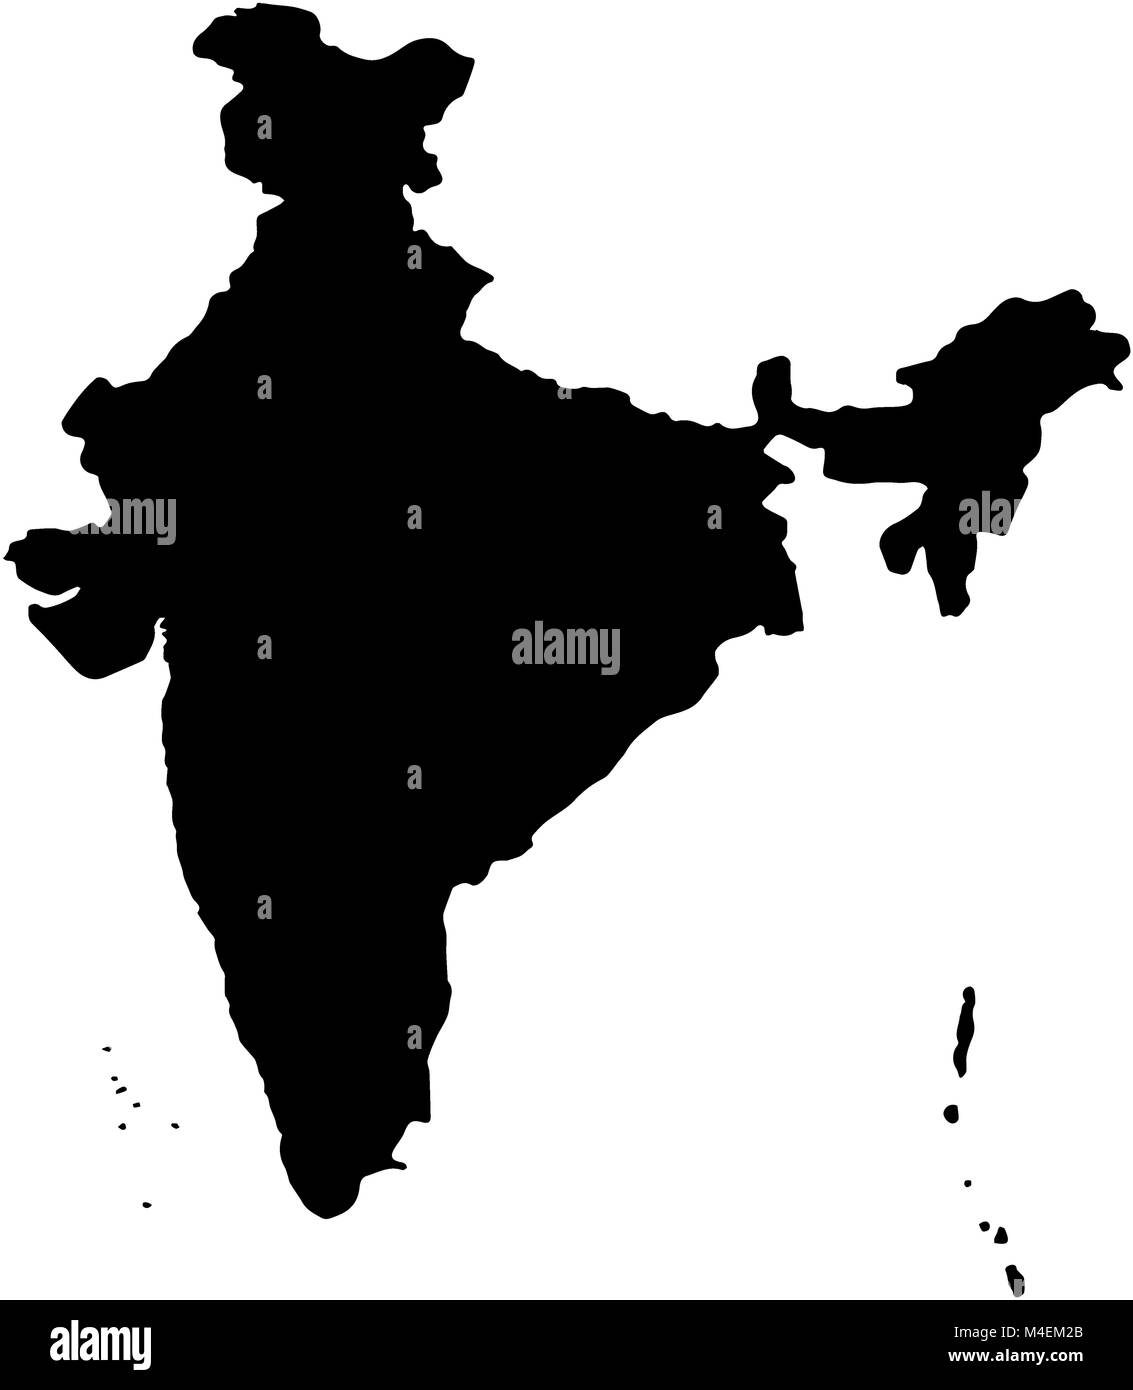 India country Map illustration black Stock Photo: 174885379 - Alamy